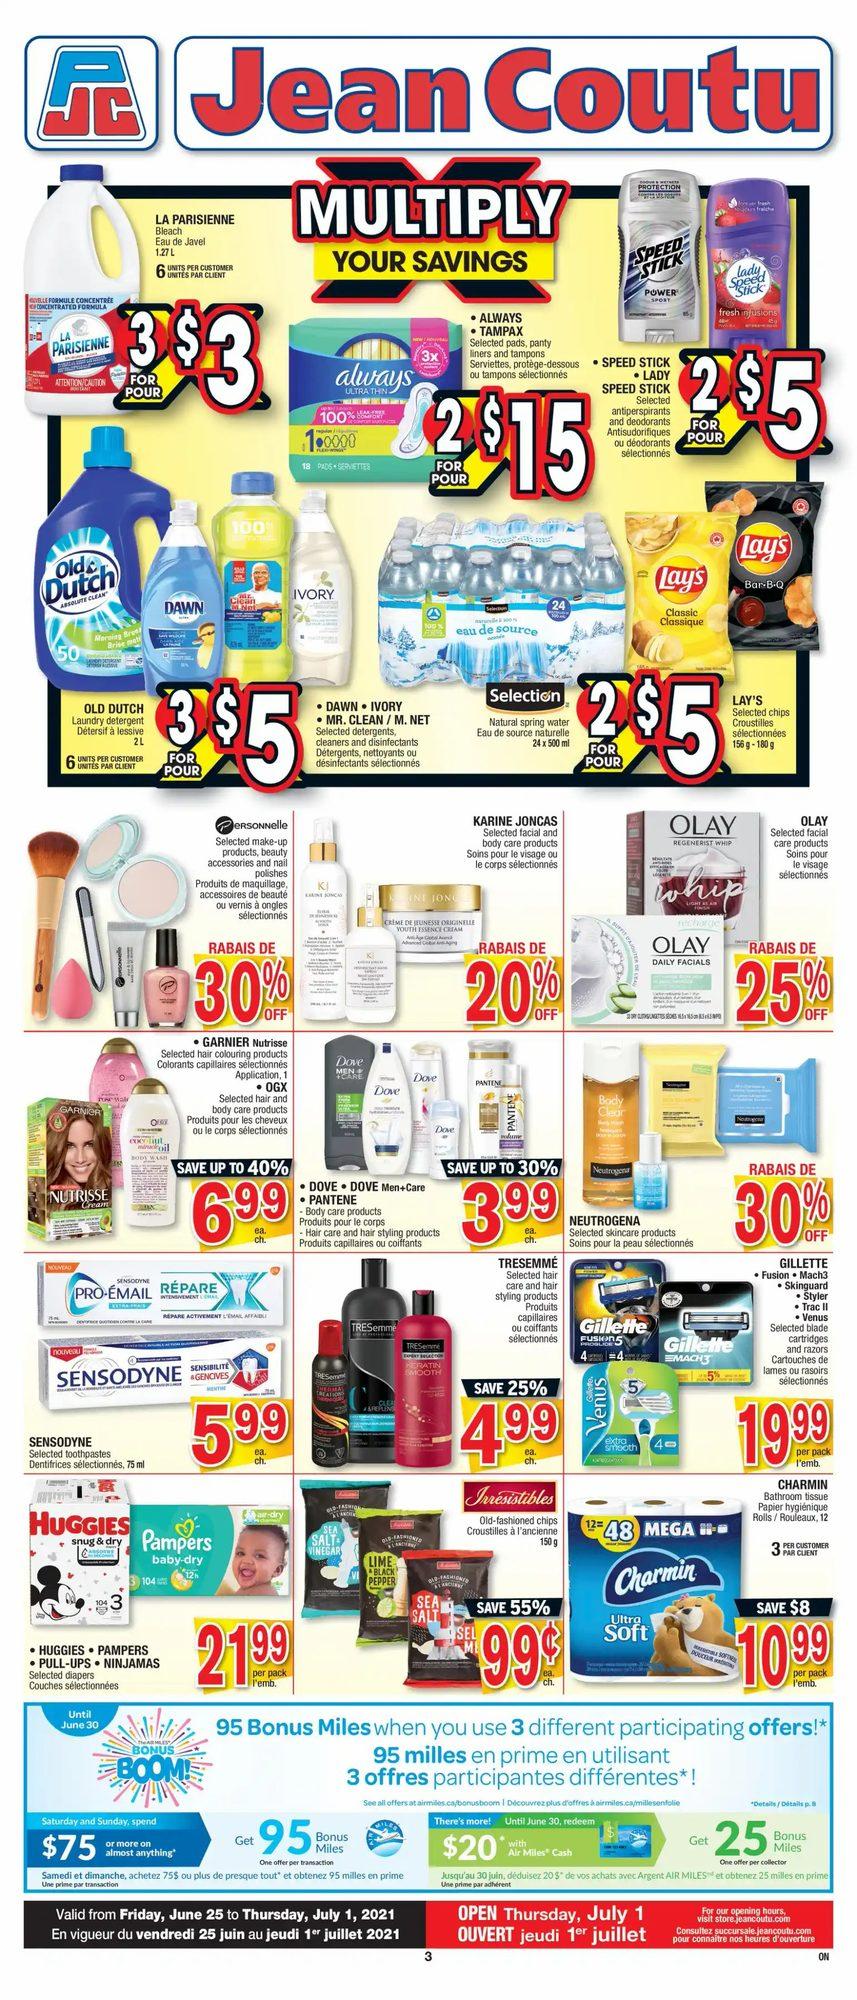 Jean Coutu - Weekly Flyer Specials